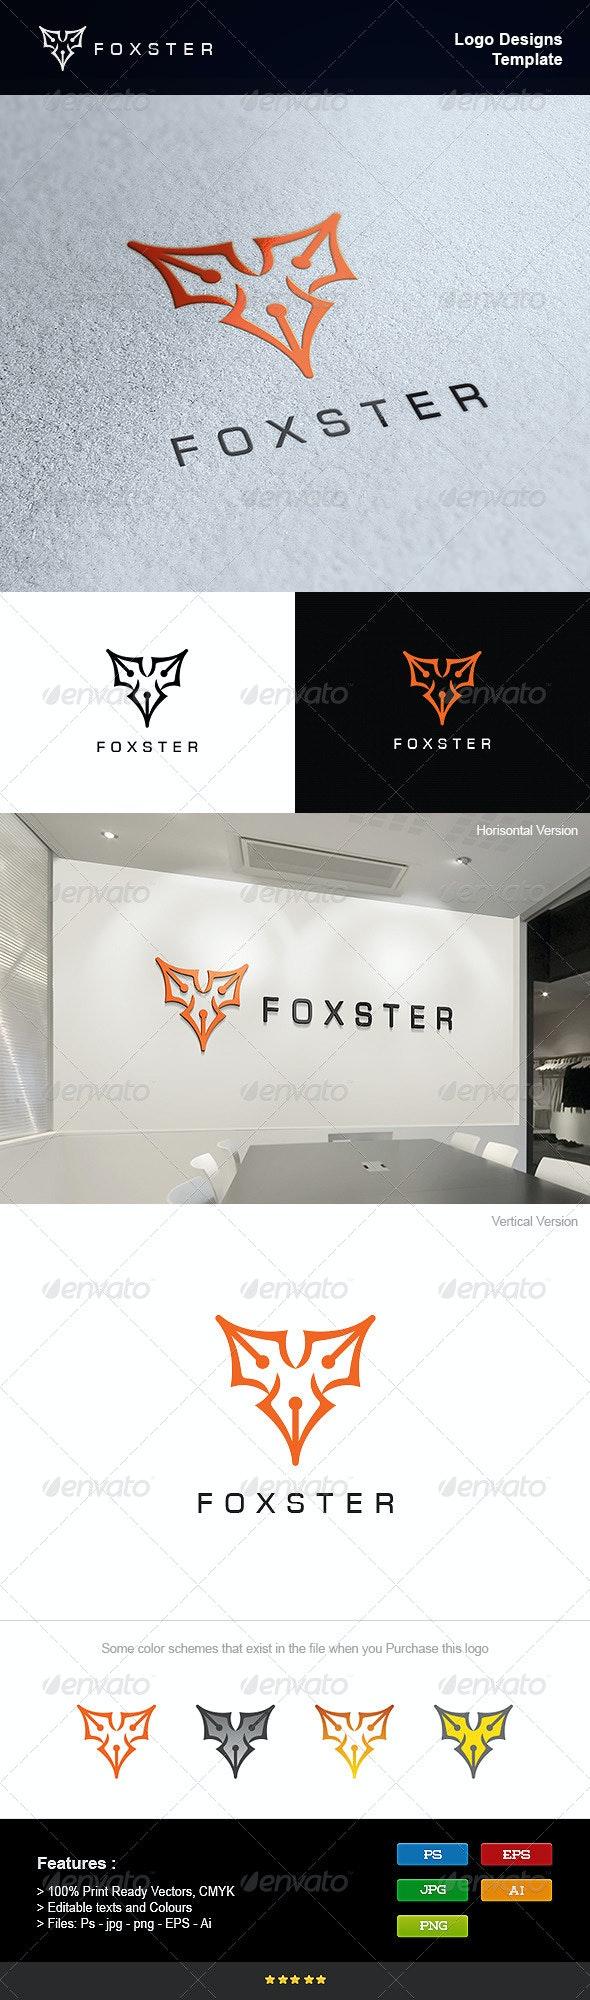 Fox Writer - Symbols Logo Templates